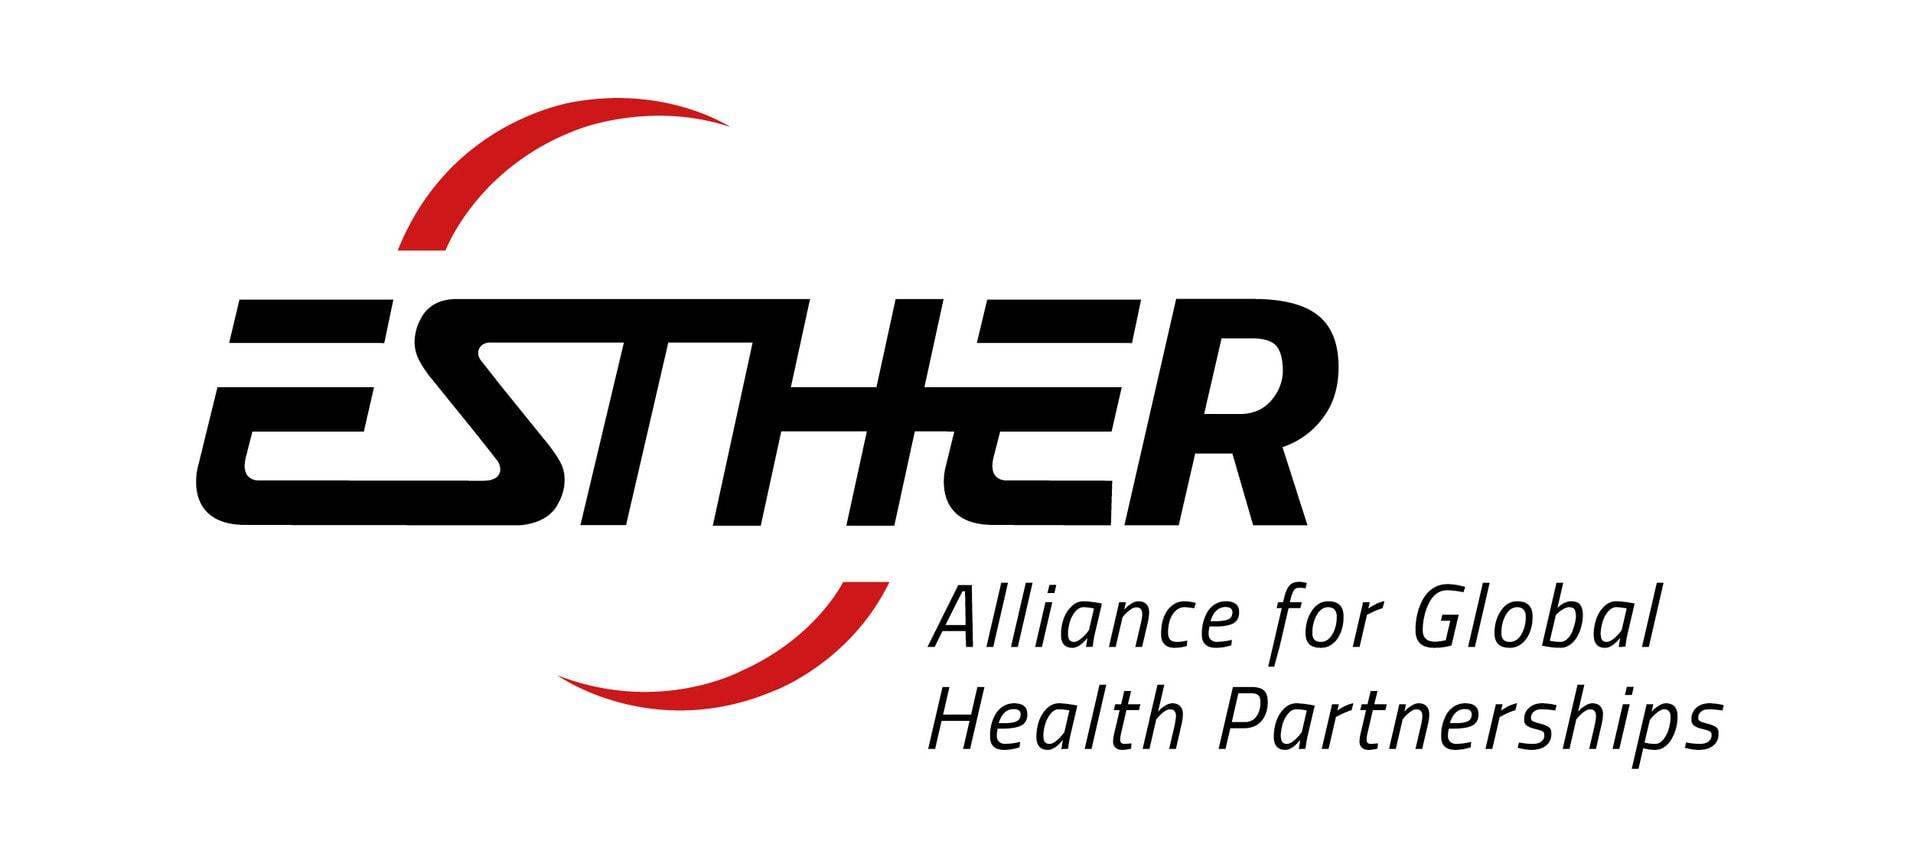 ESTHER Logo engl RGB